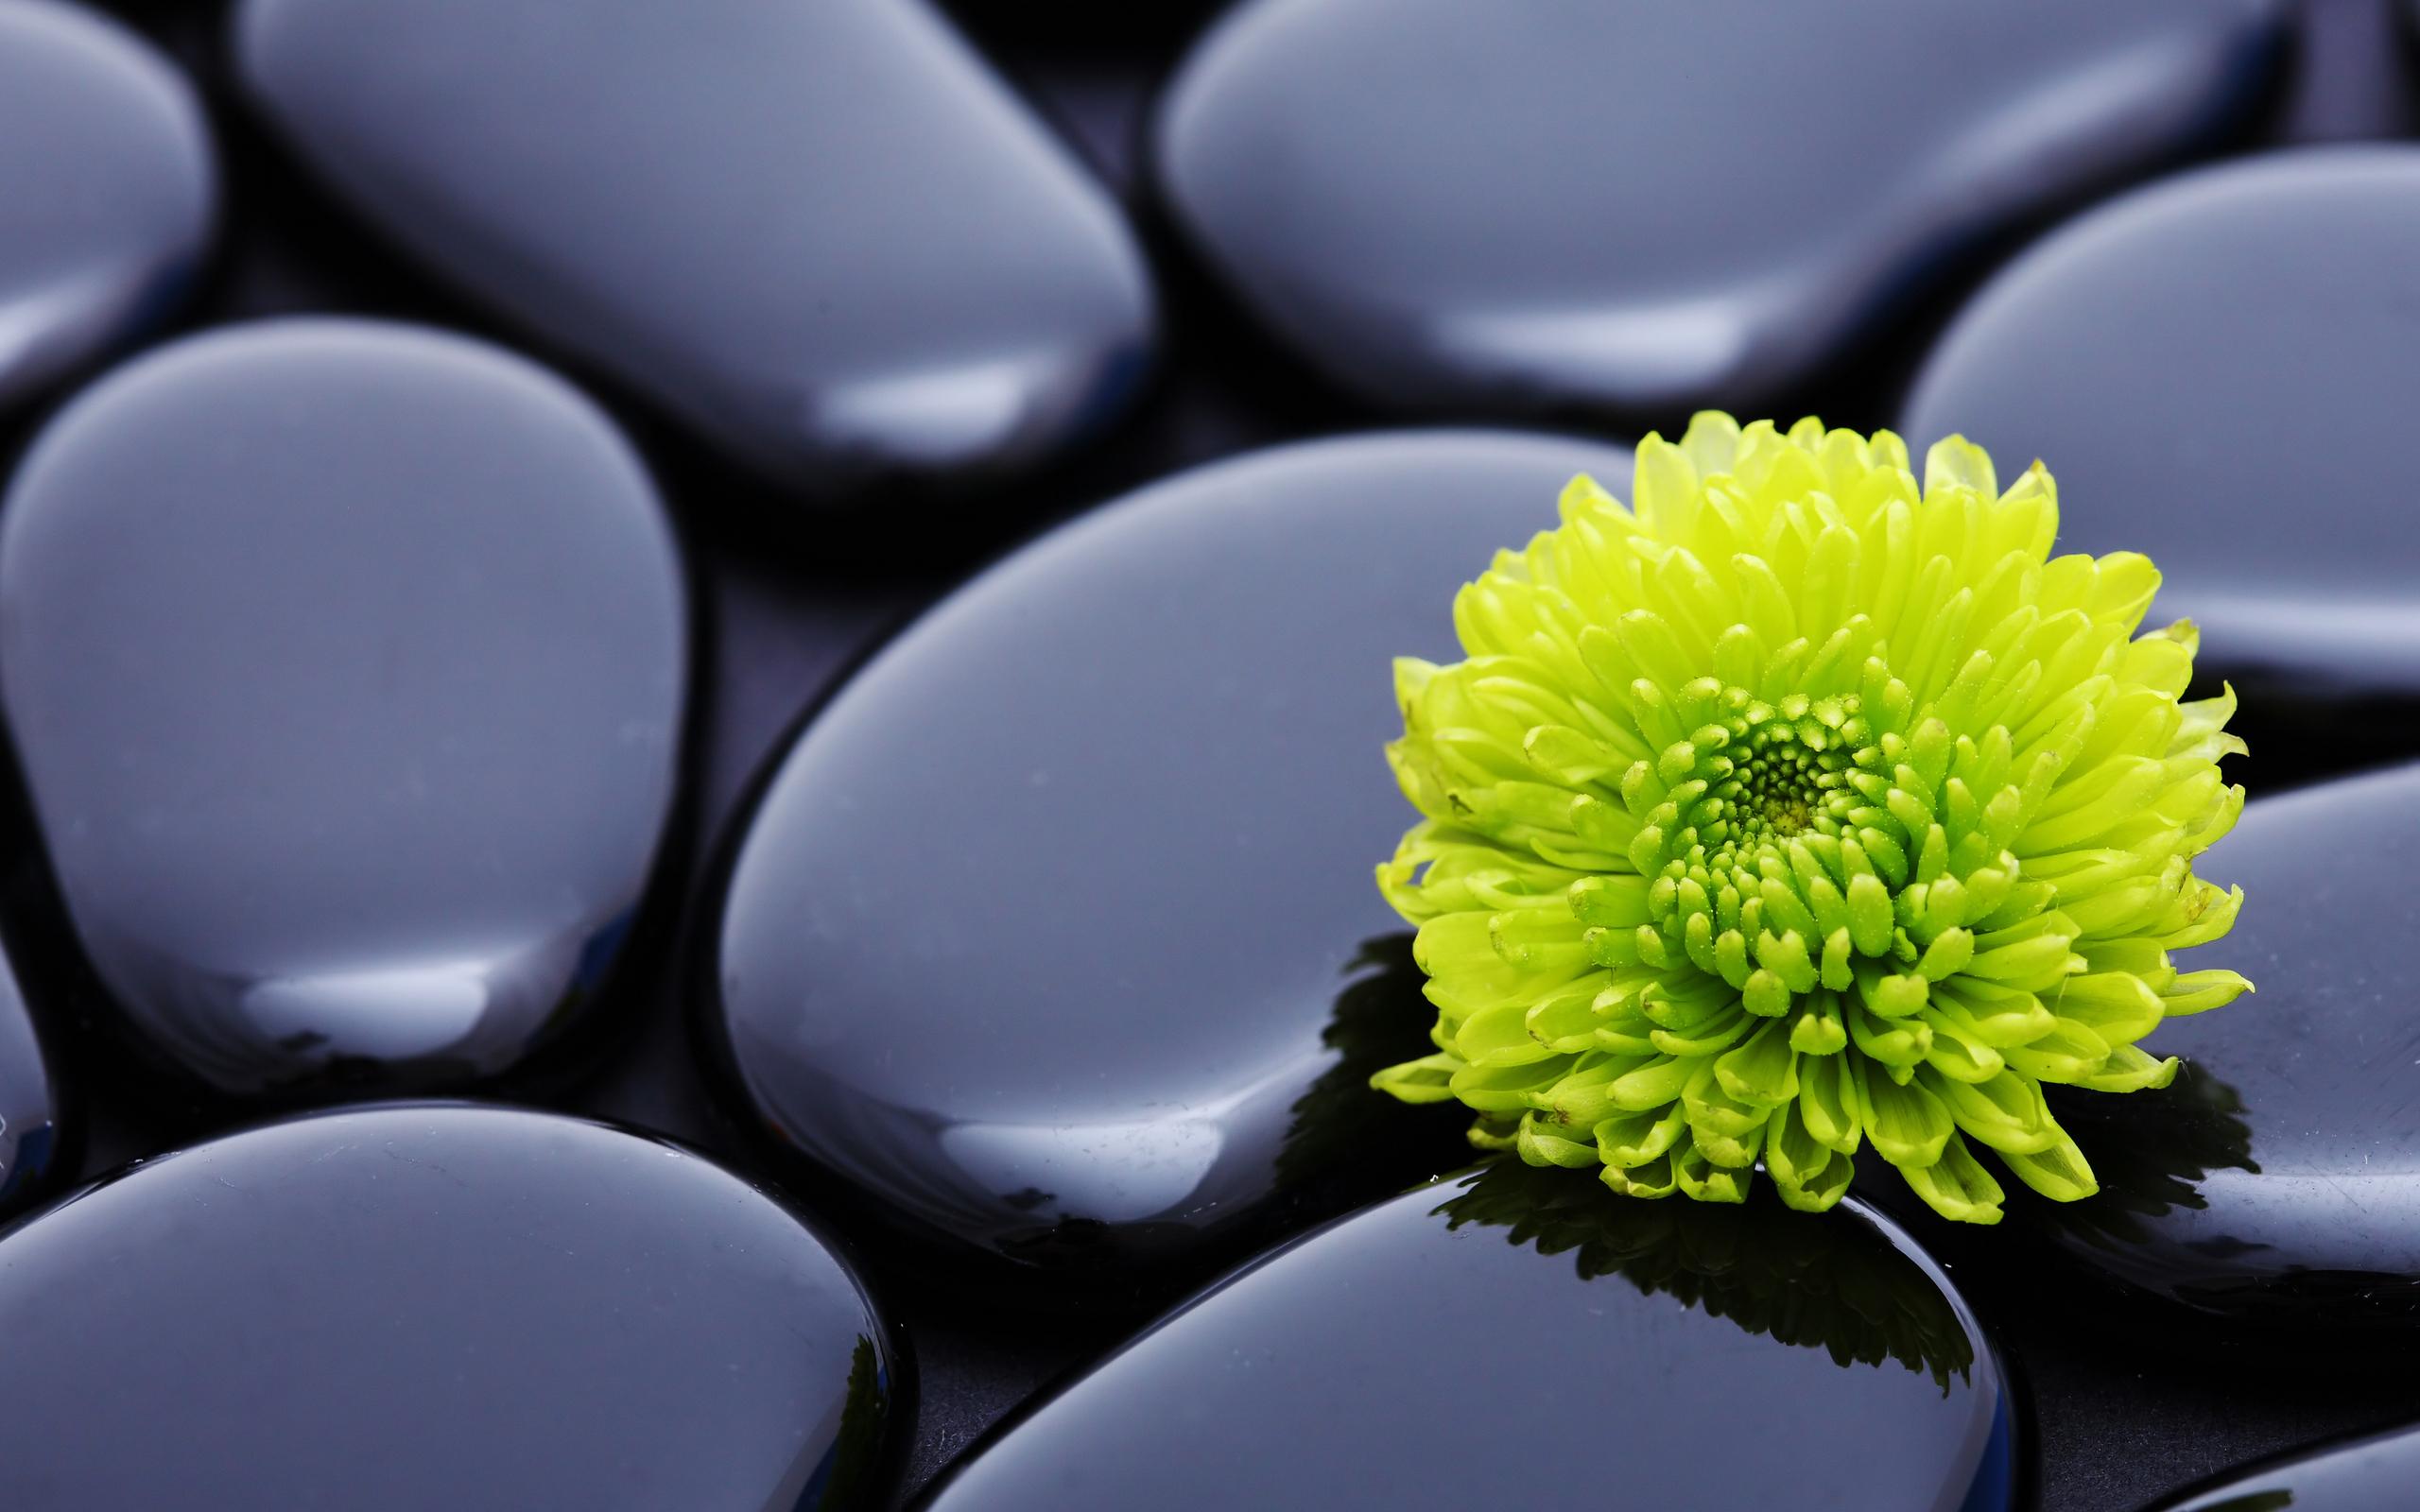 flowers stones zen wallpaper 2560x1600 9229 wallpaperup. Black Bedroom Furniture Sets. Home Design Ideas